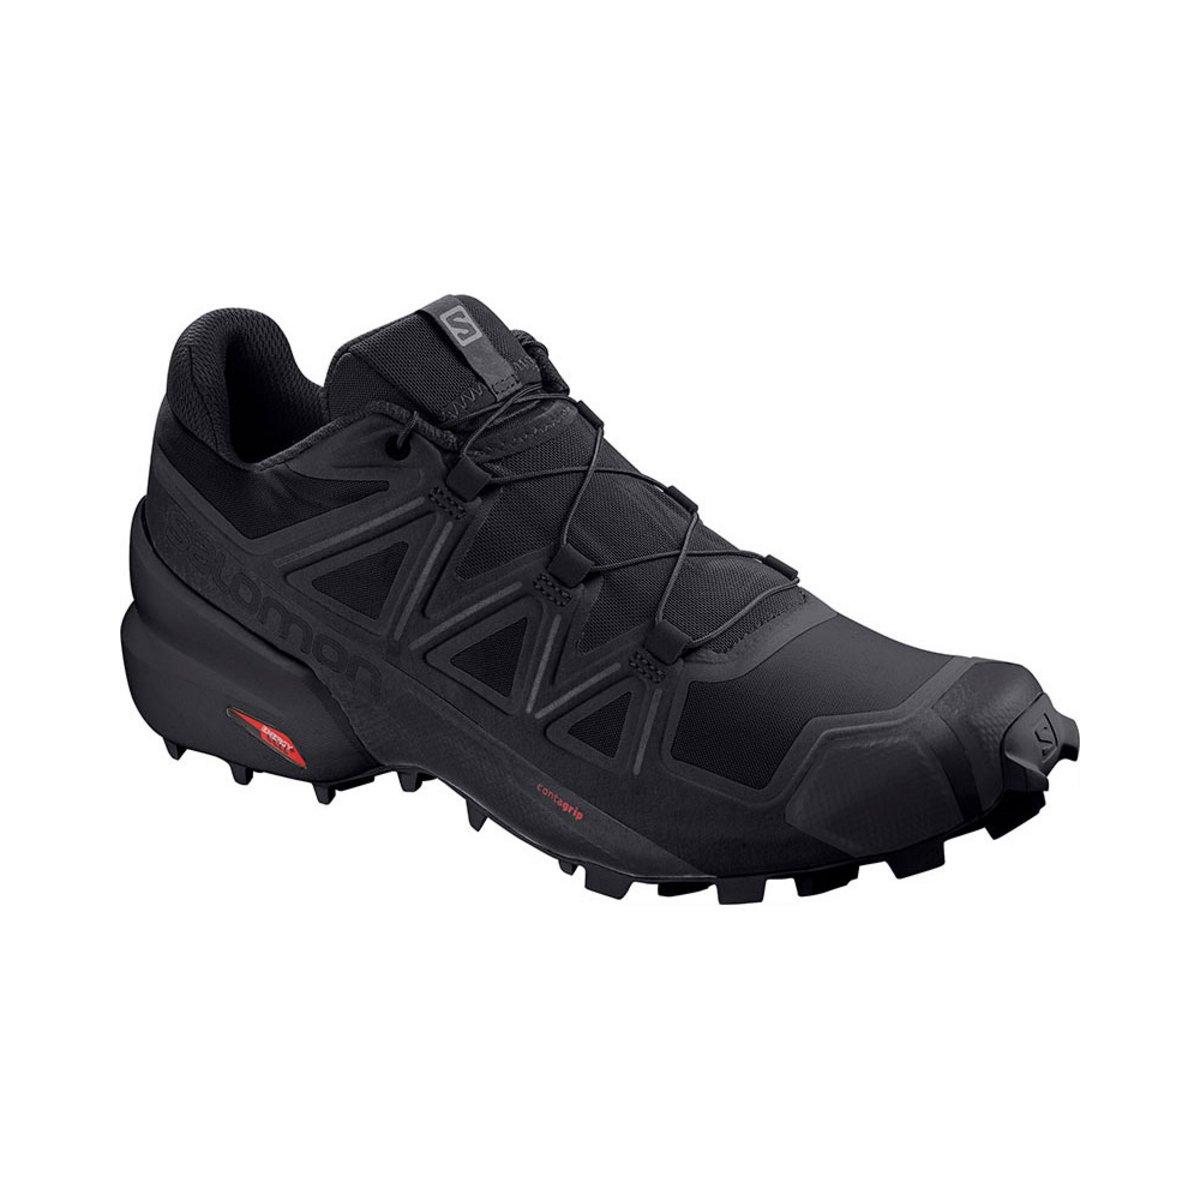 Salomon Women's Speedcross 5 Trail Running Shoes 0